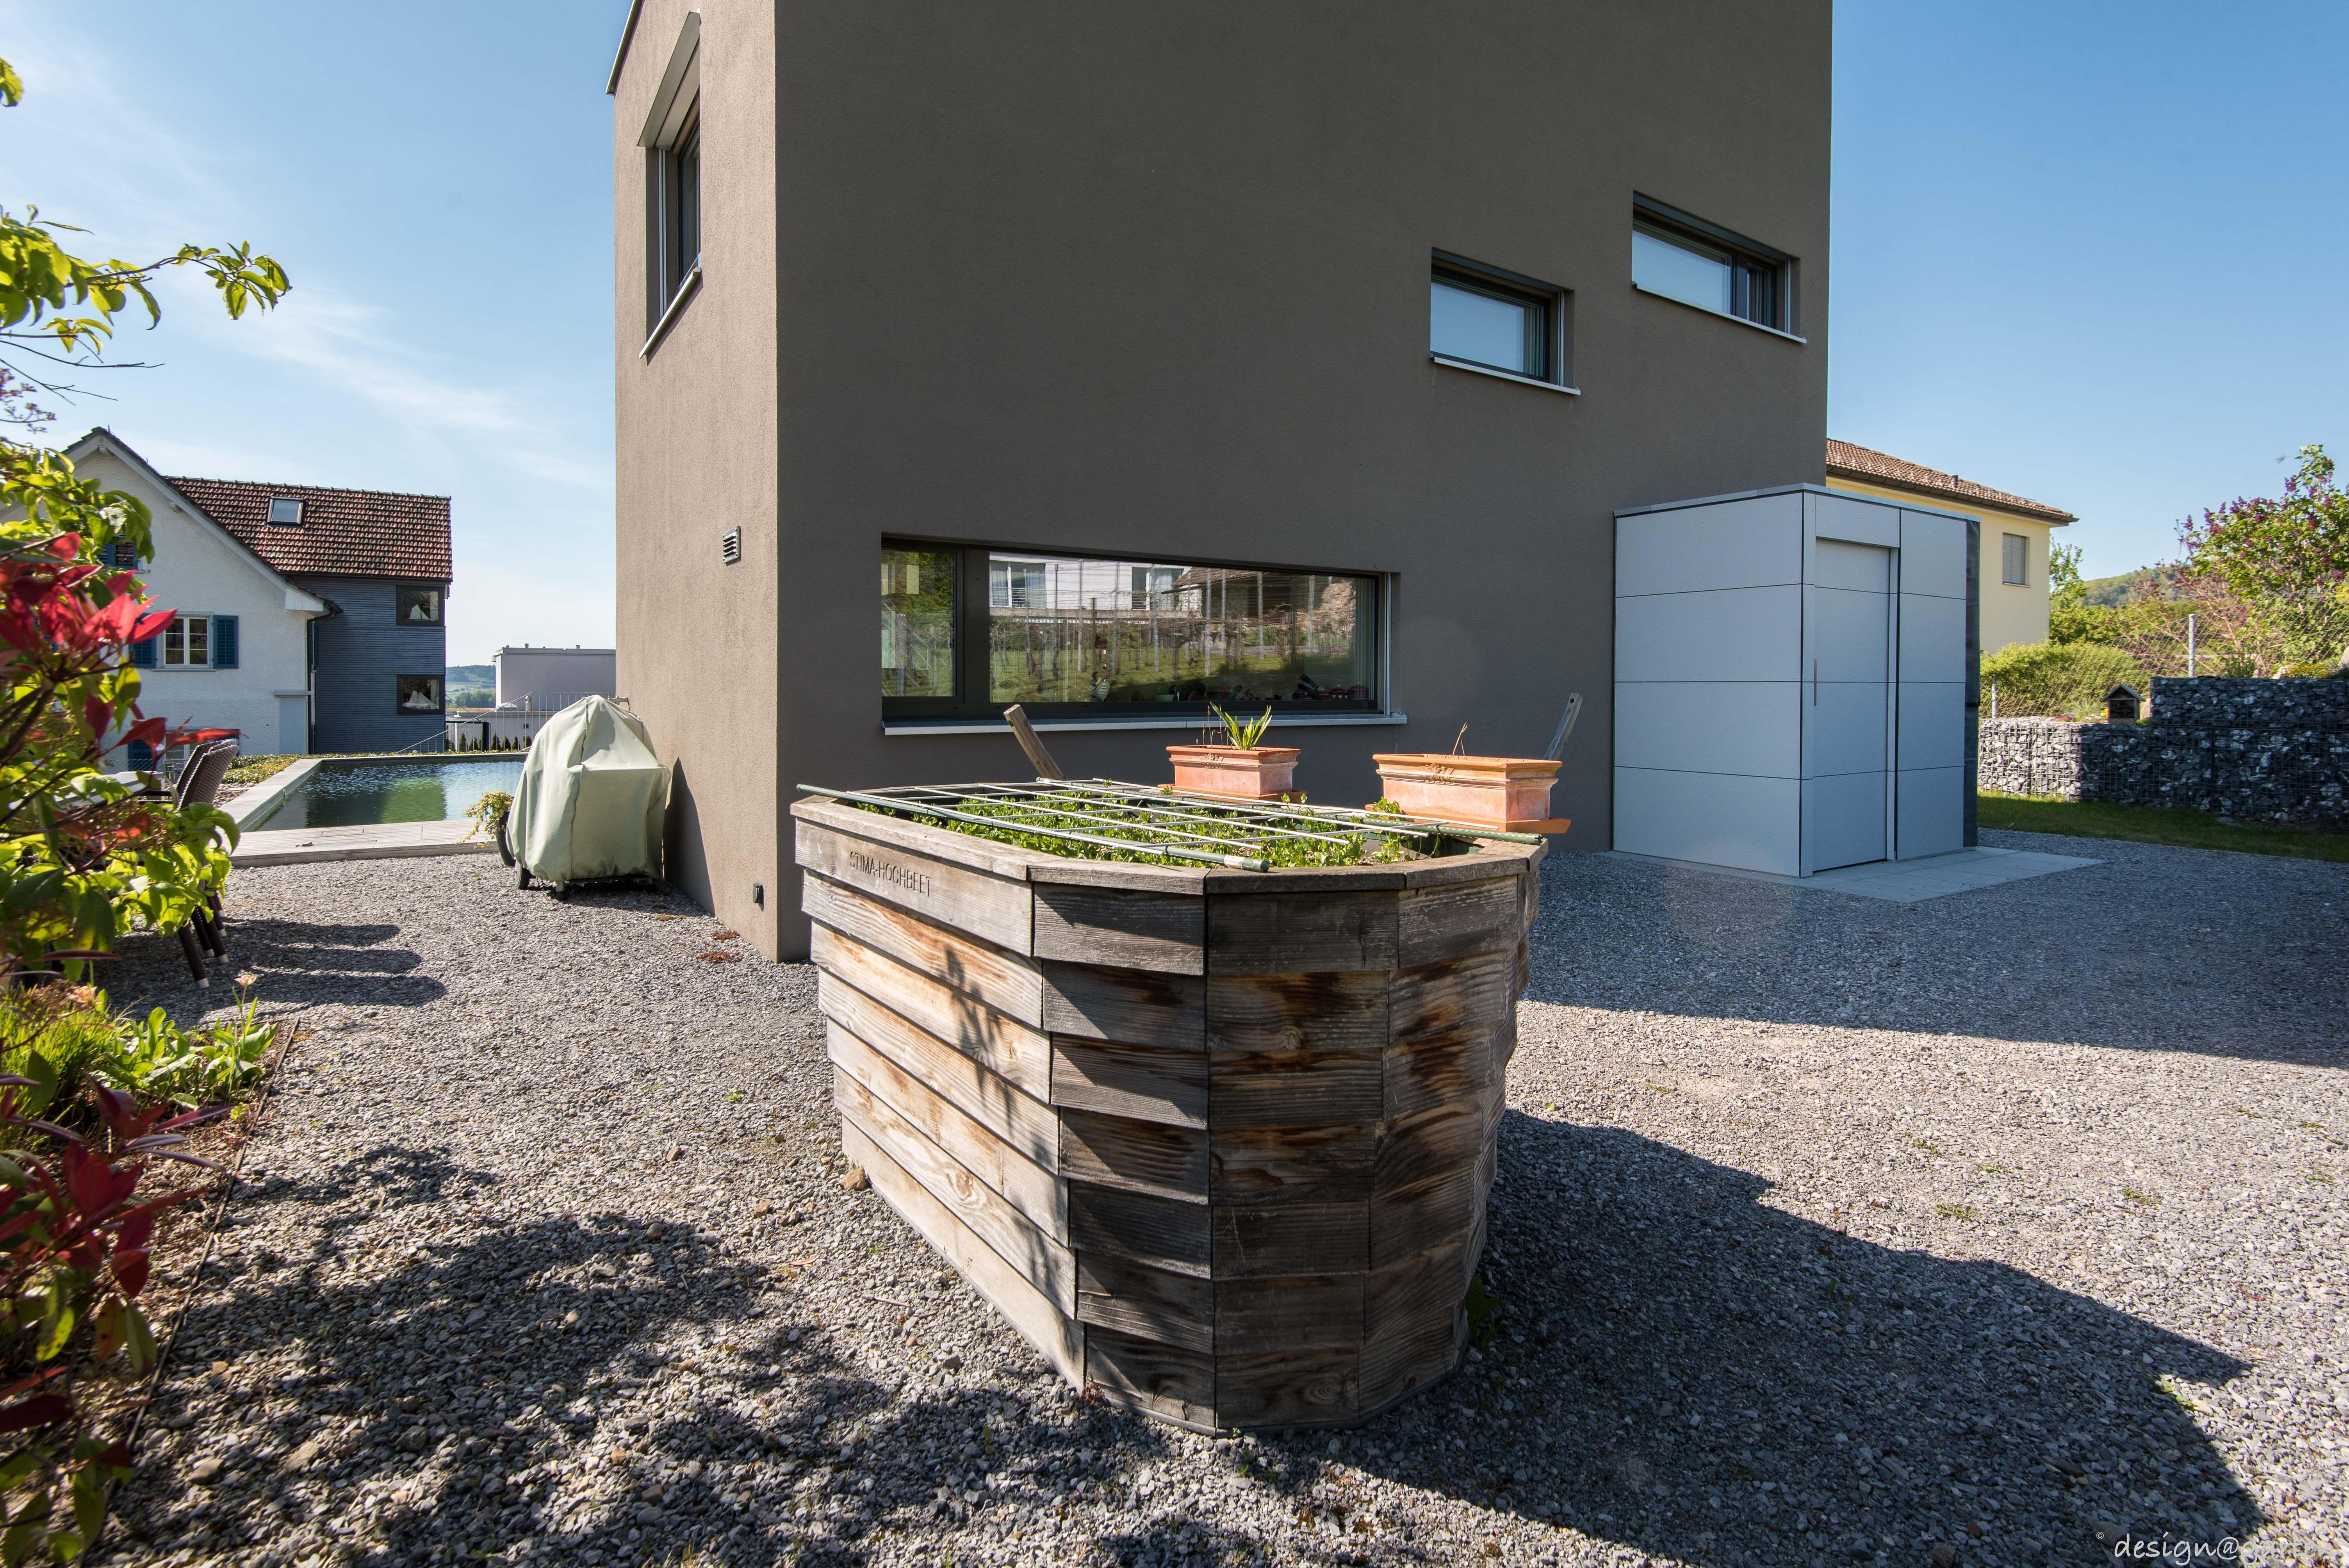 Design Gartenhaus _gart in Zürich by designgarten